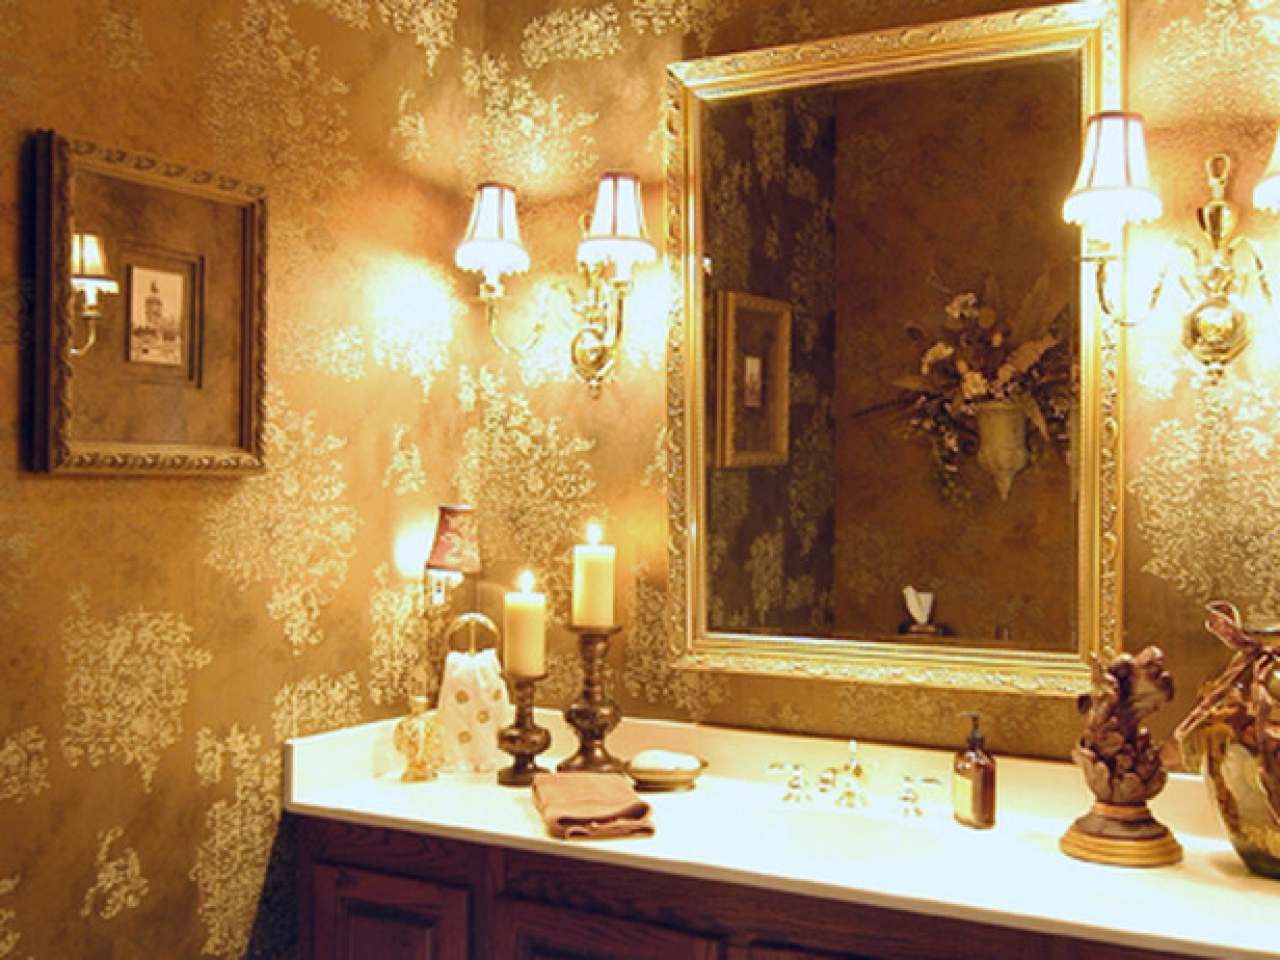 Bathroom bedroom dp beaudet wallpaper traditional bathroom s4x3 lg jpg 1280x960